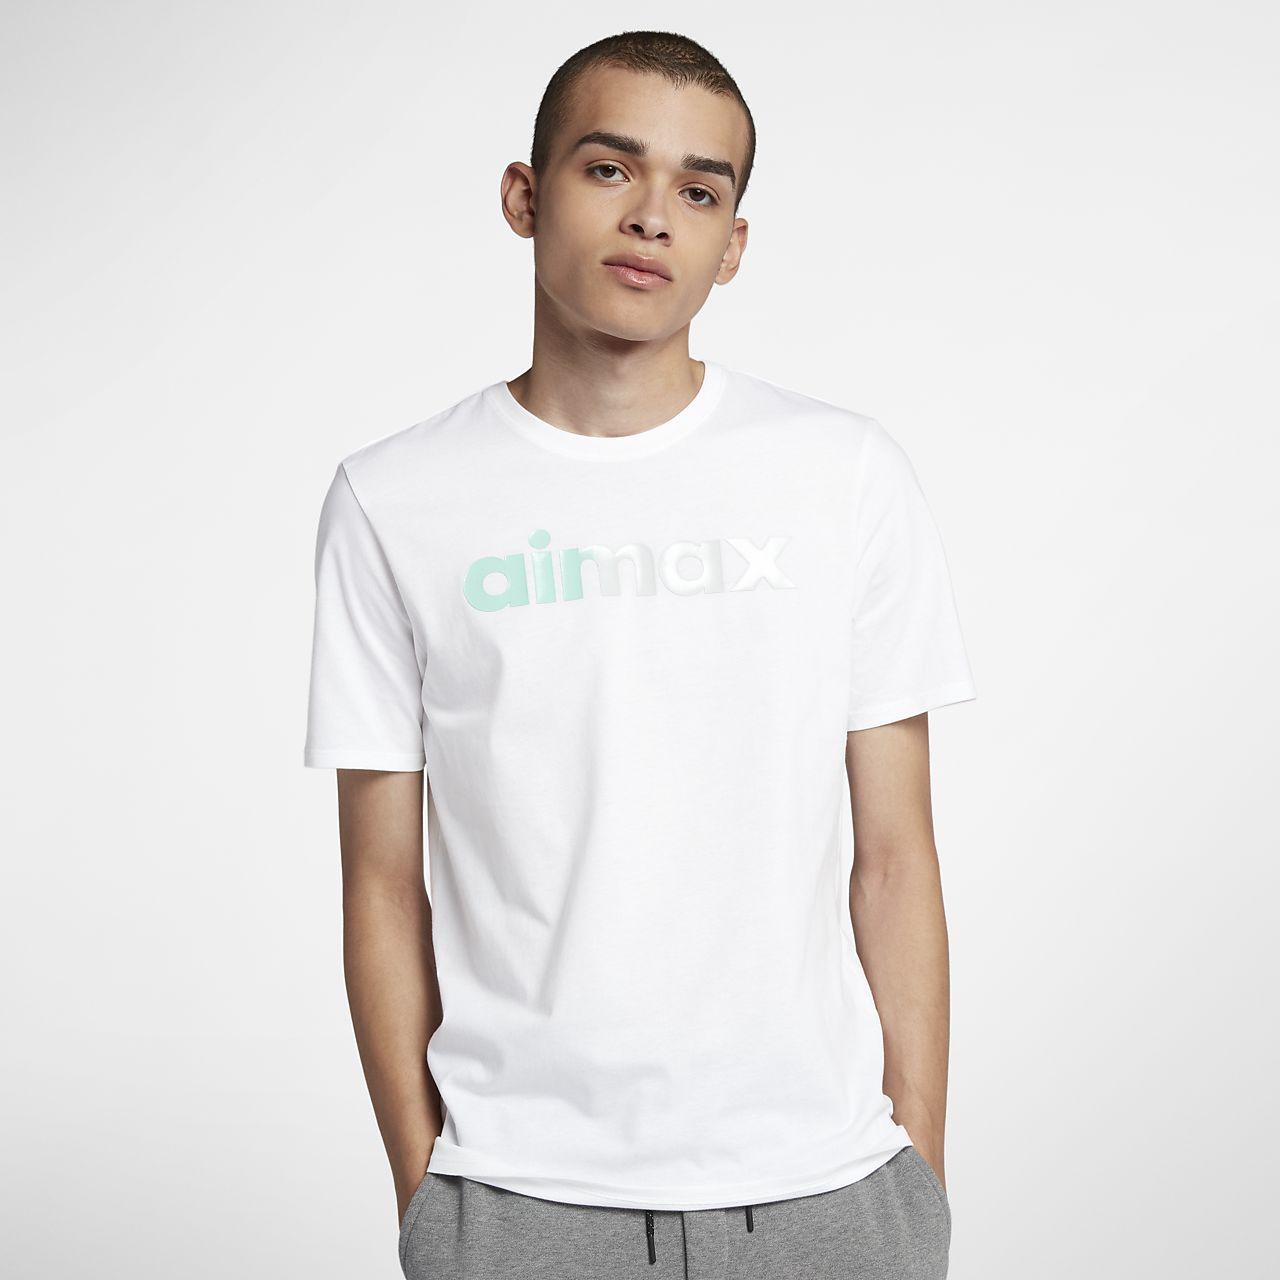 Nike Sportswear Air Max 95 Herren T Shirt